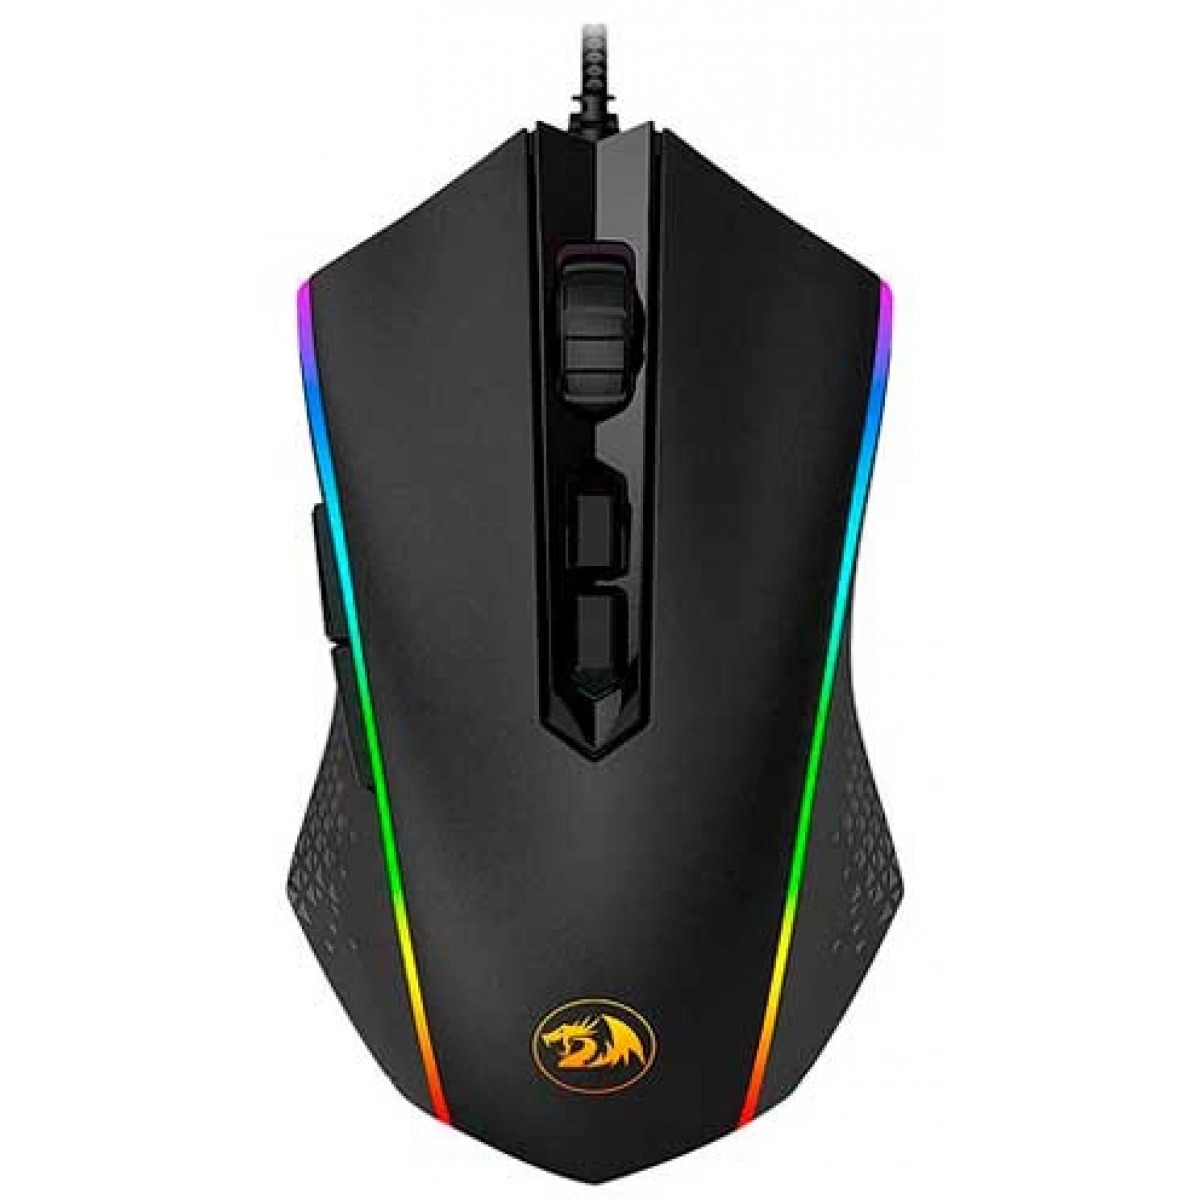 Mouse Gamer 10000DPI RGB Memeanlion M710 Redragon